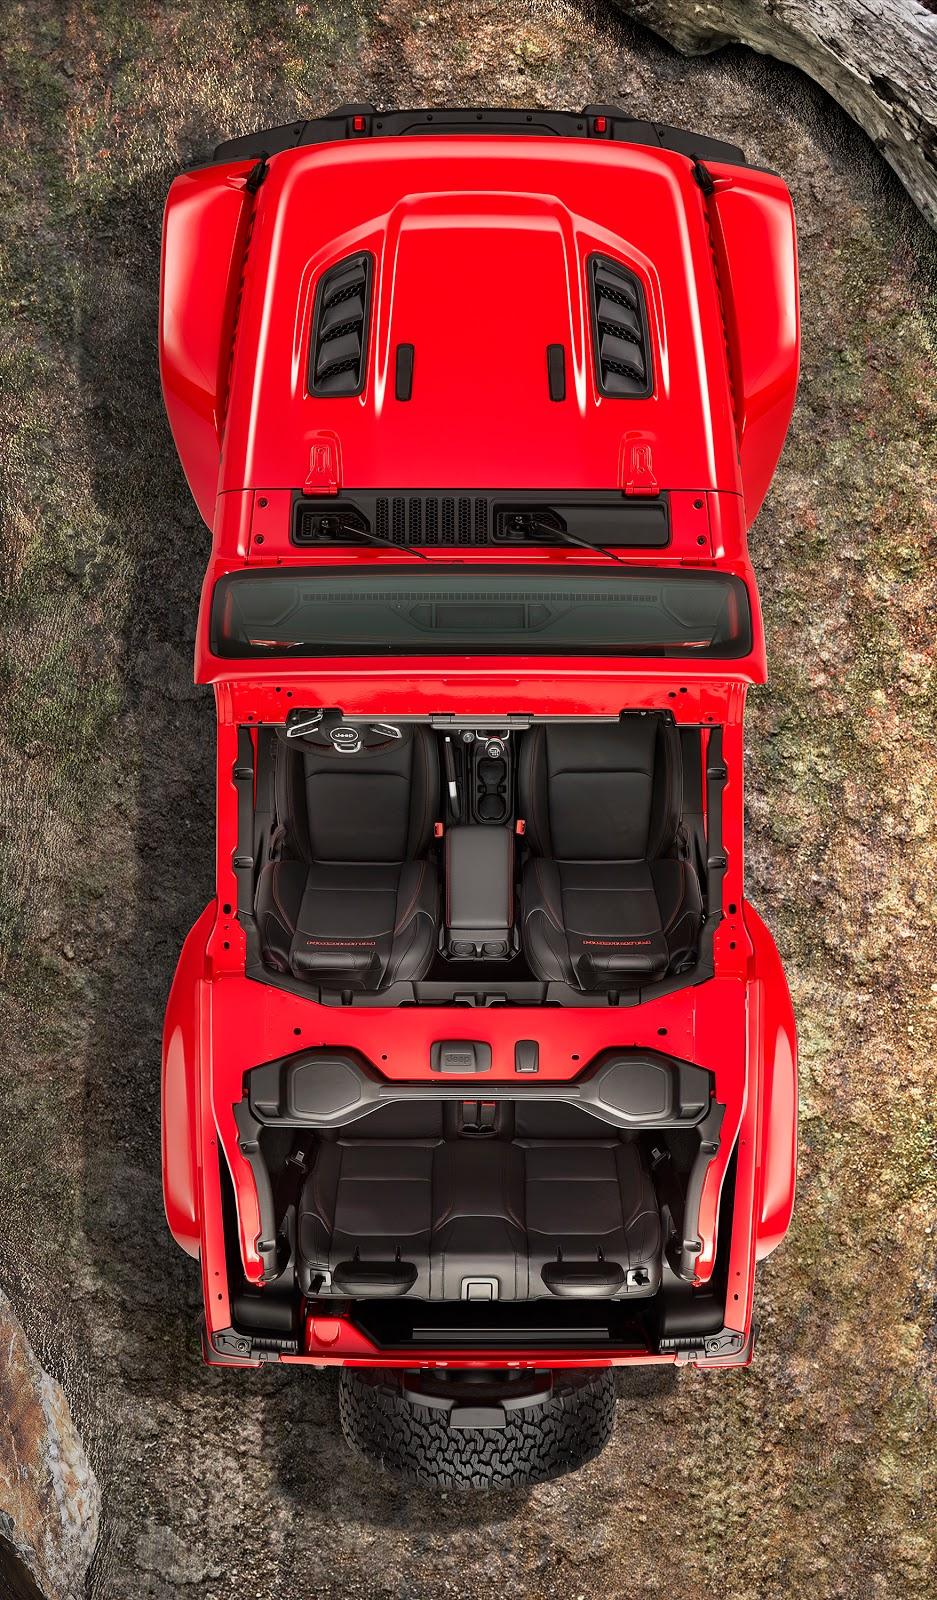 jeep wrangler overland jl travel door different models expedition open journal four